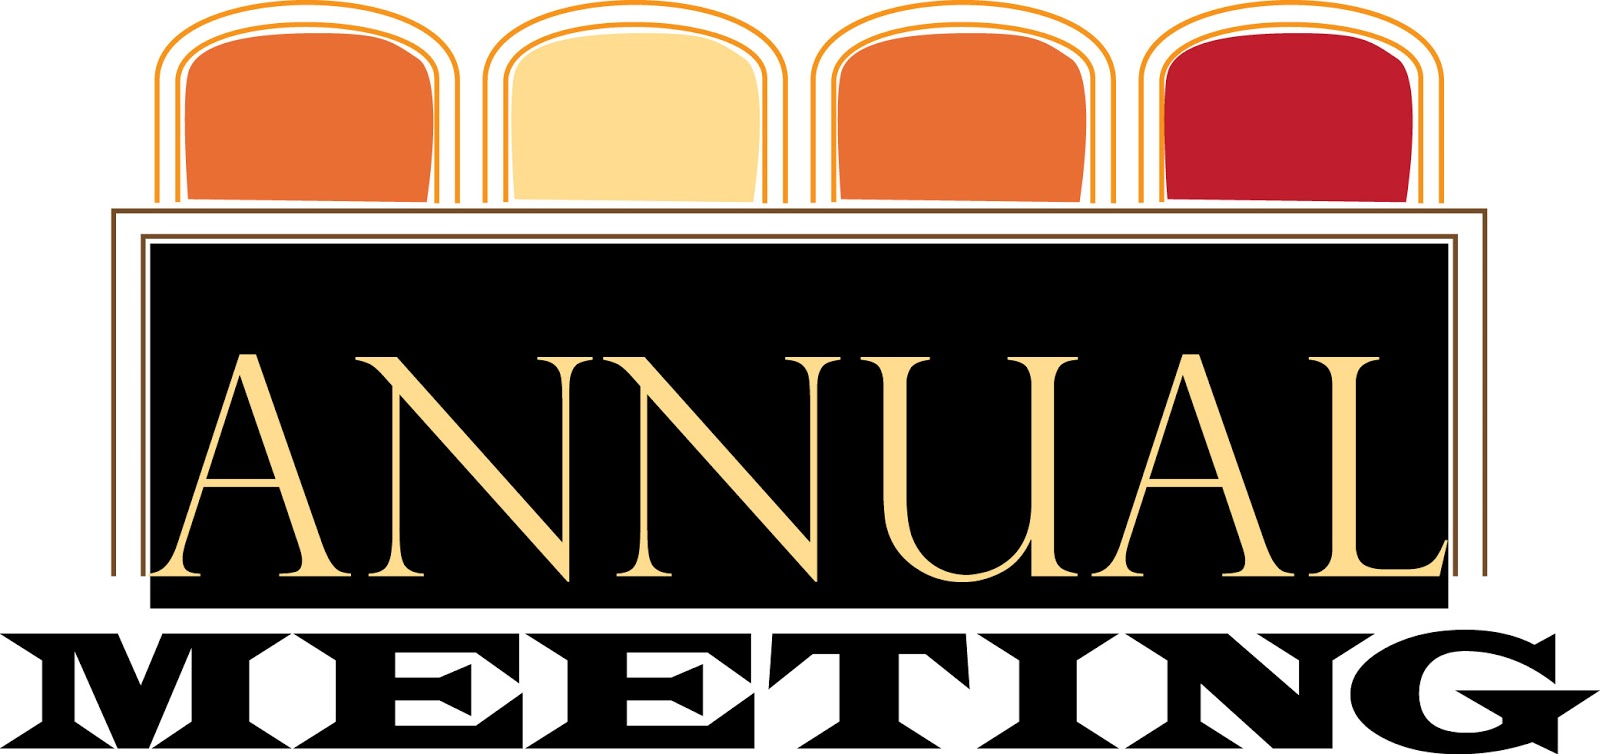 St. Barnabas Anglican Church: Annual Meeting February 24th!